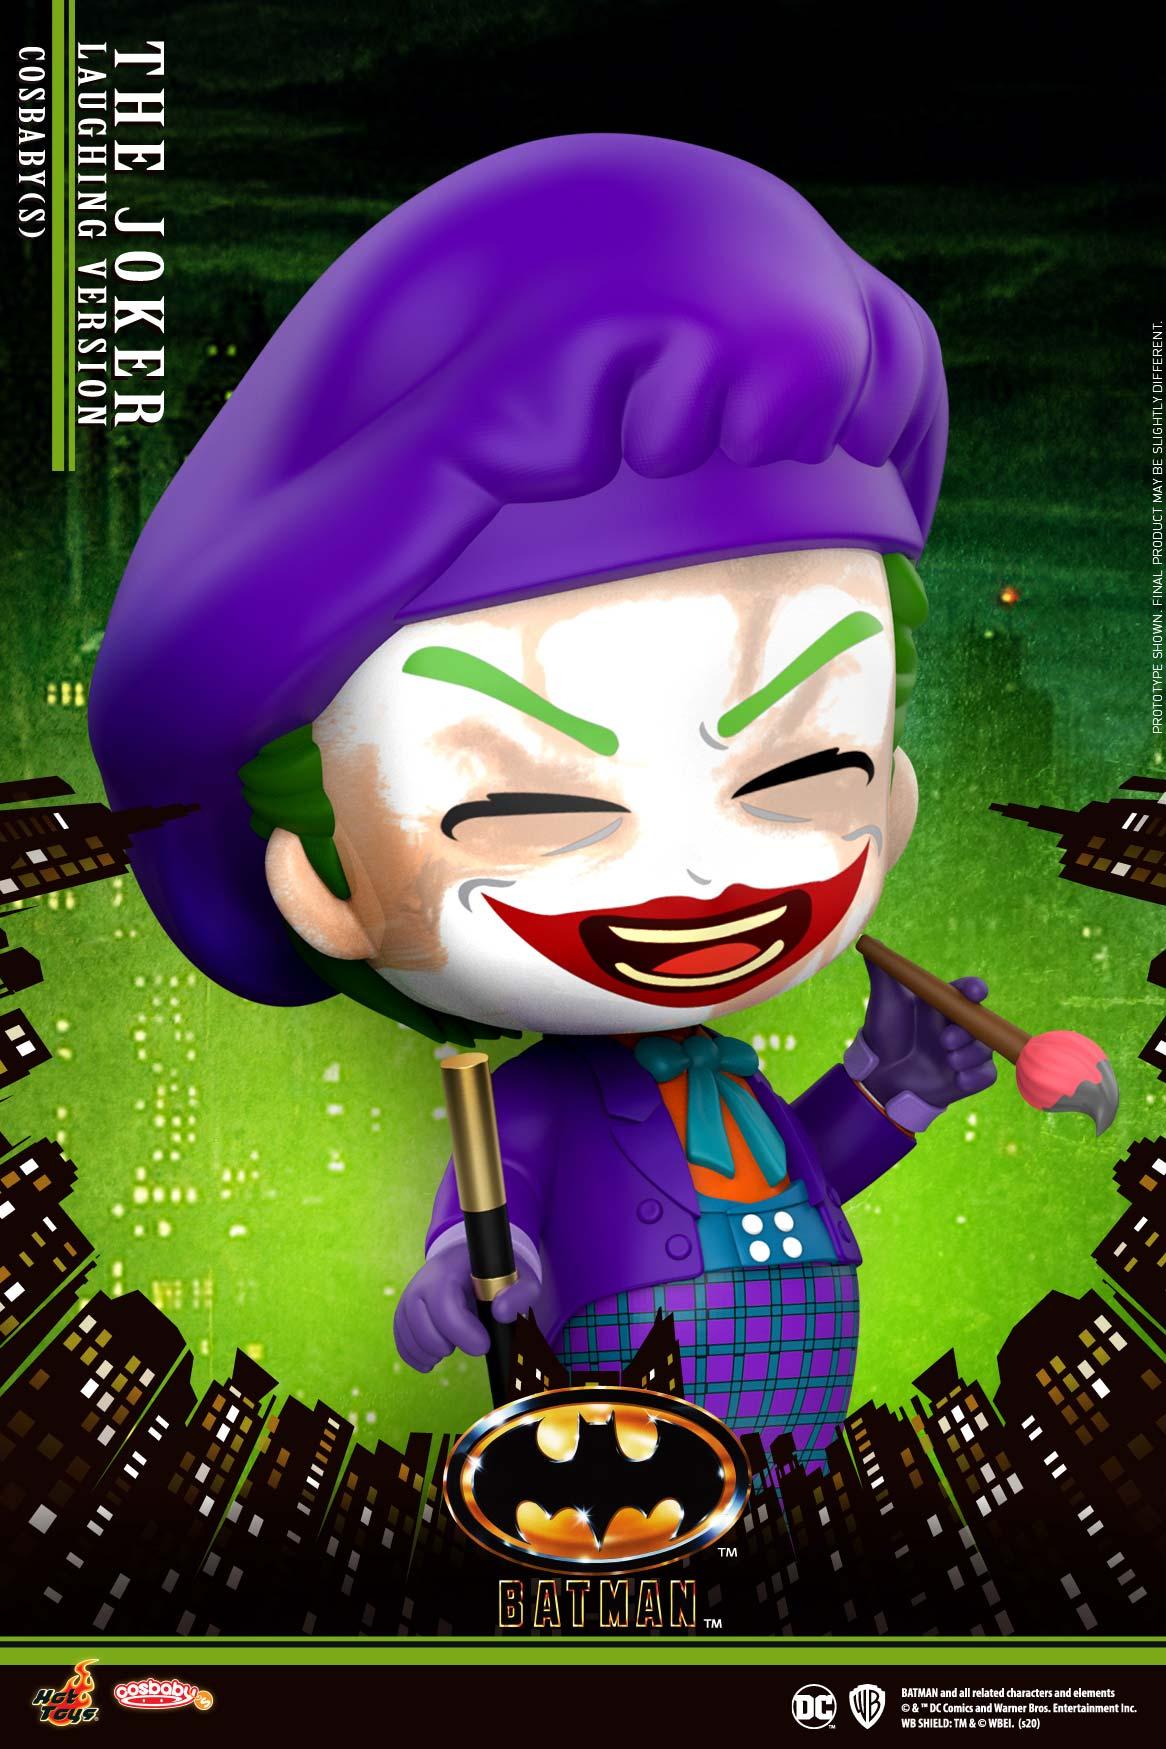 Batman-1989_COSB712_The-Joker-(Laughing)_V02